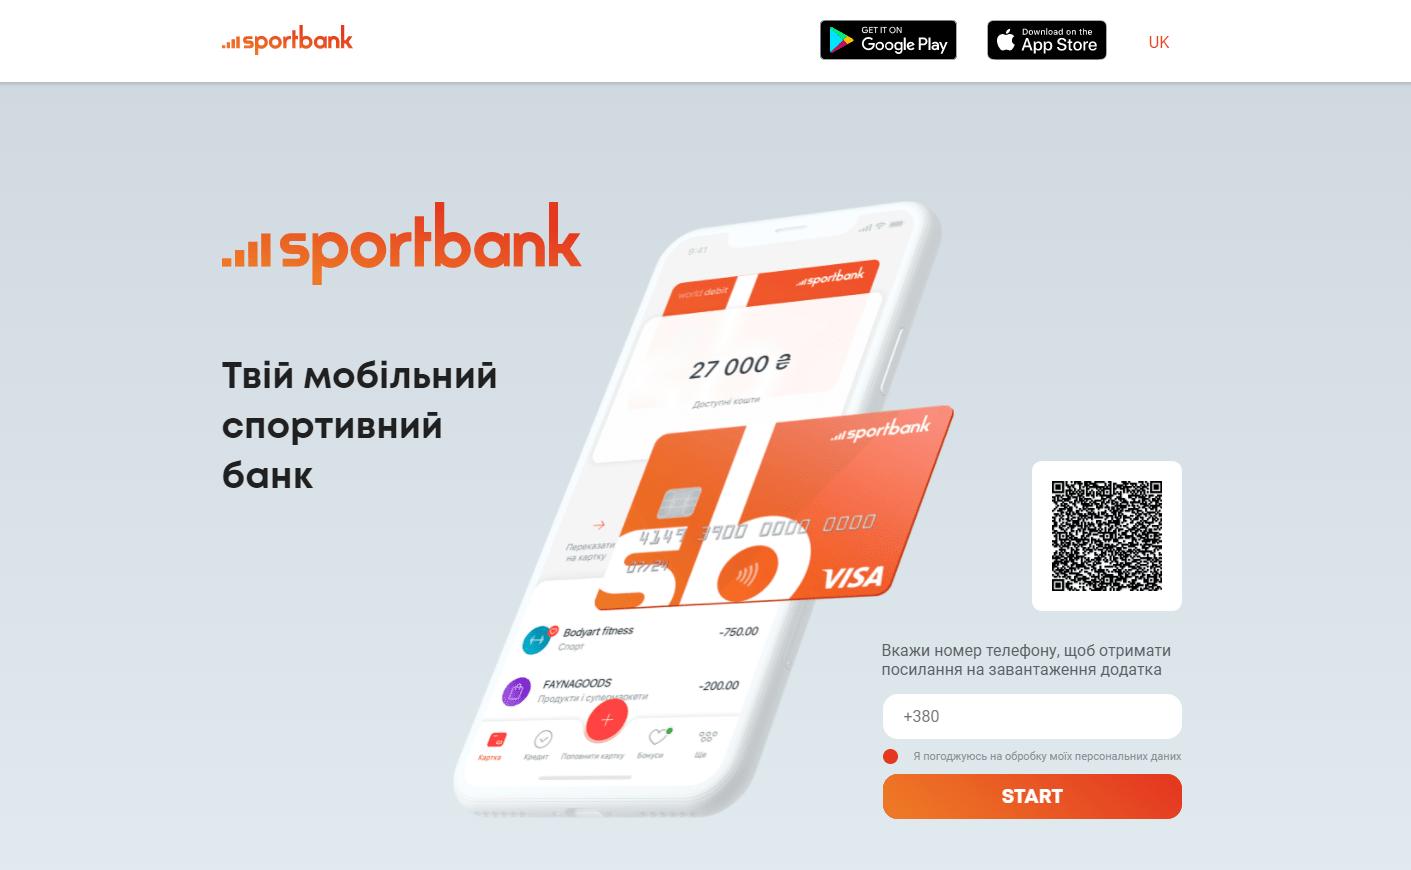 sportbank-site